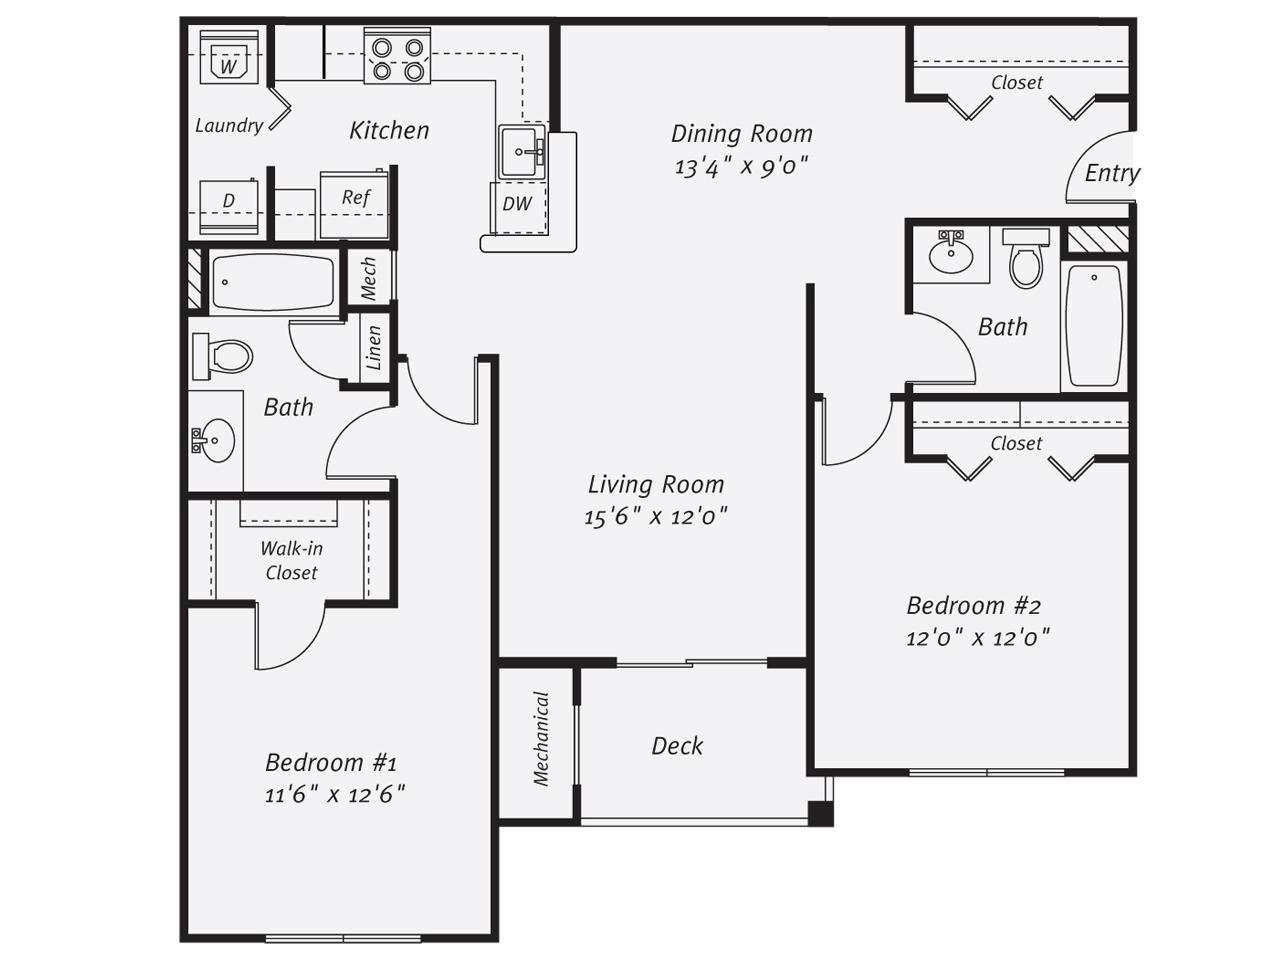 Ny coram thepointatpineridge p0571769 ny014 b2 2 floorplan